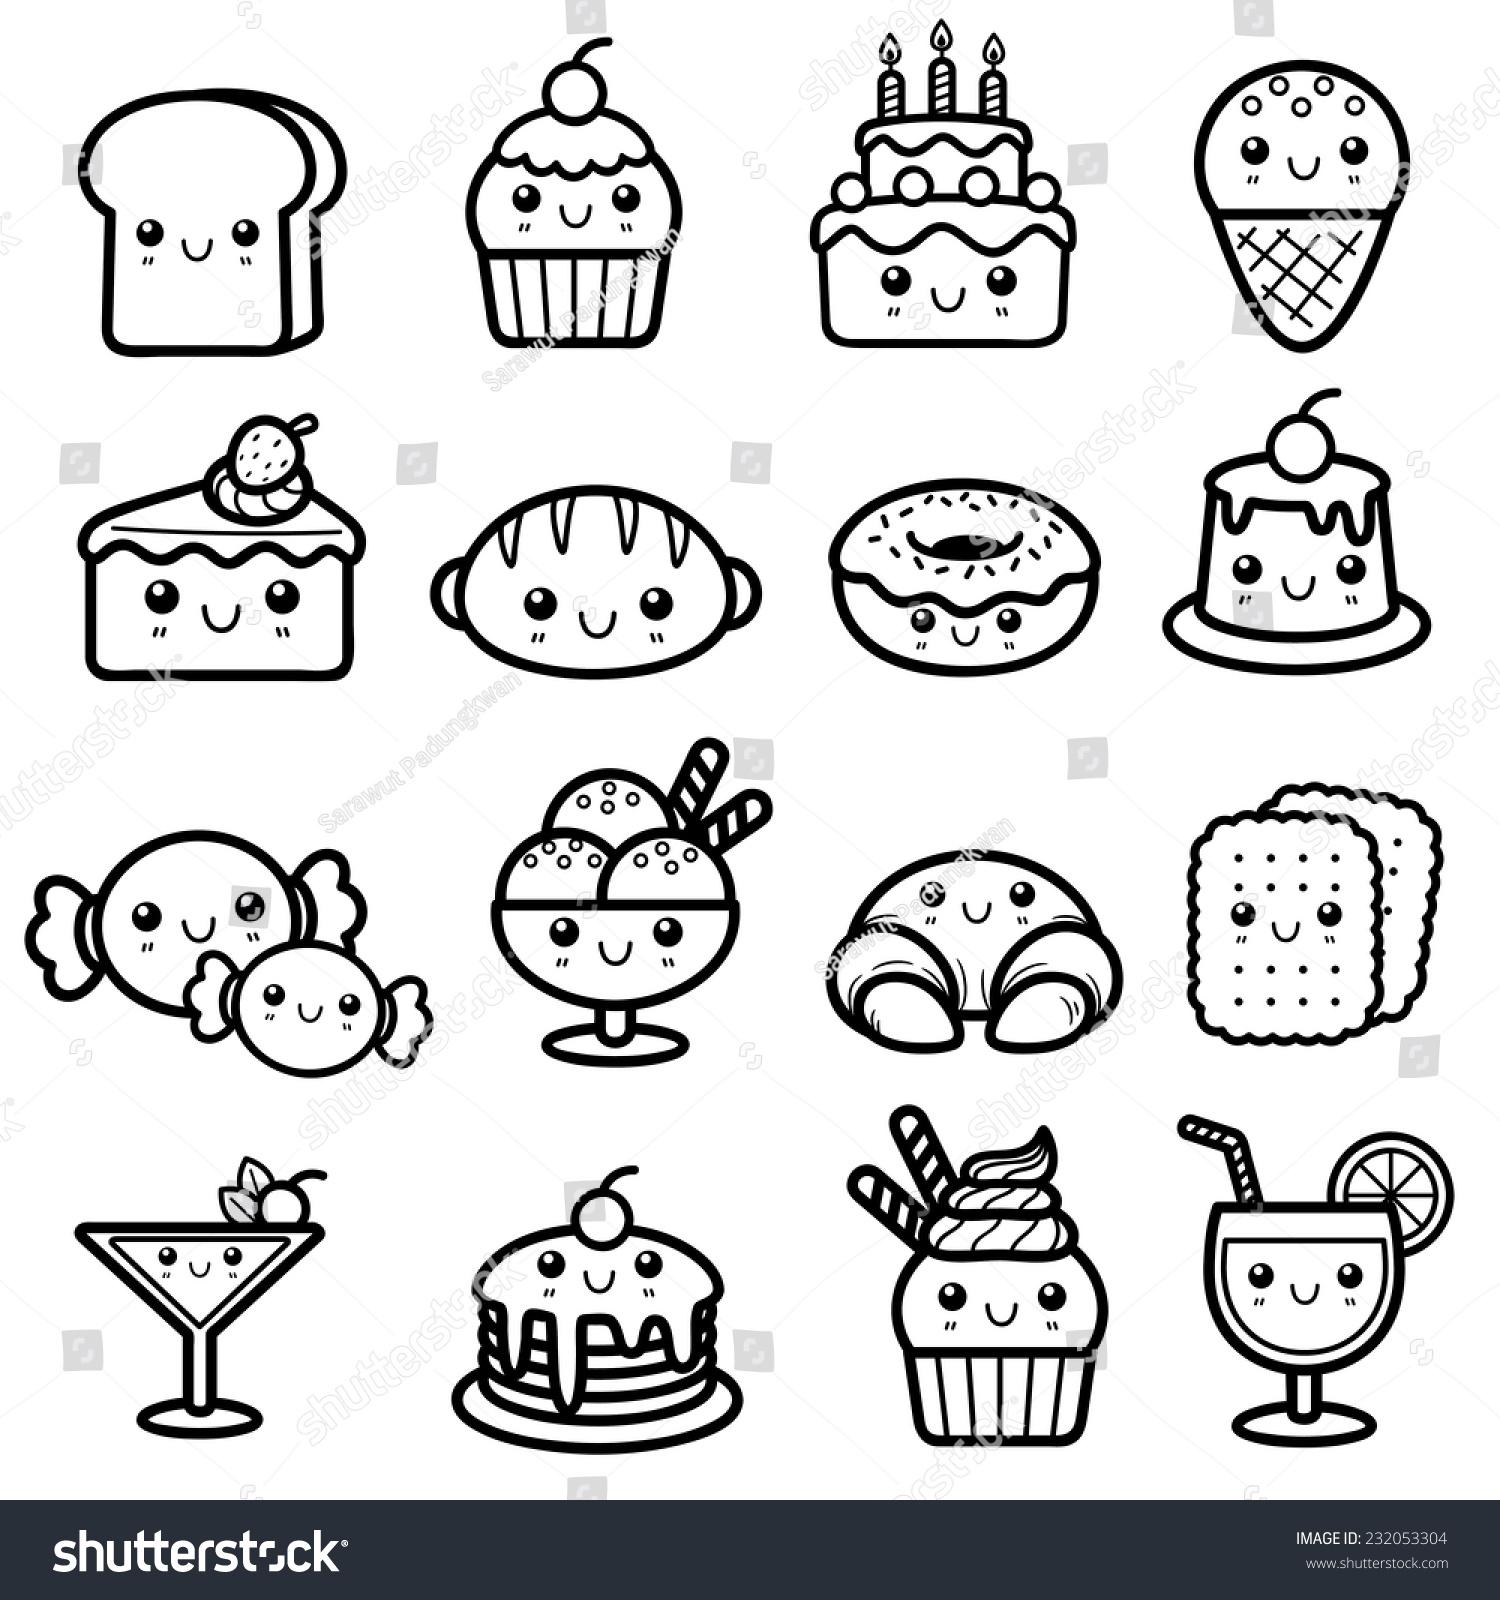 Vector Illustration Dessert Coloring Book Stock Vector